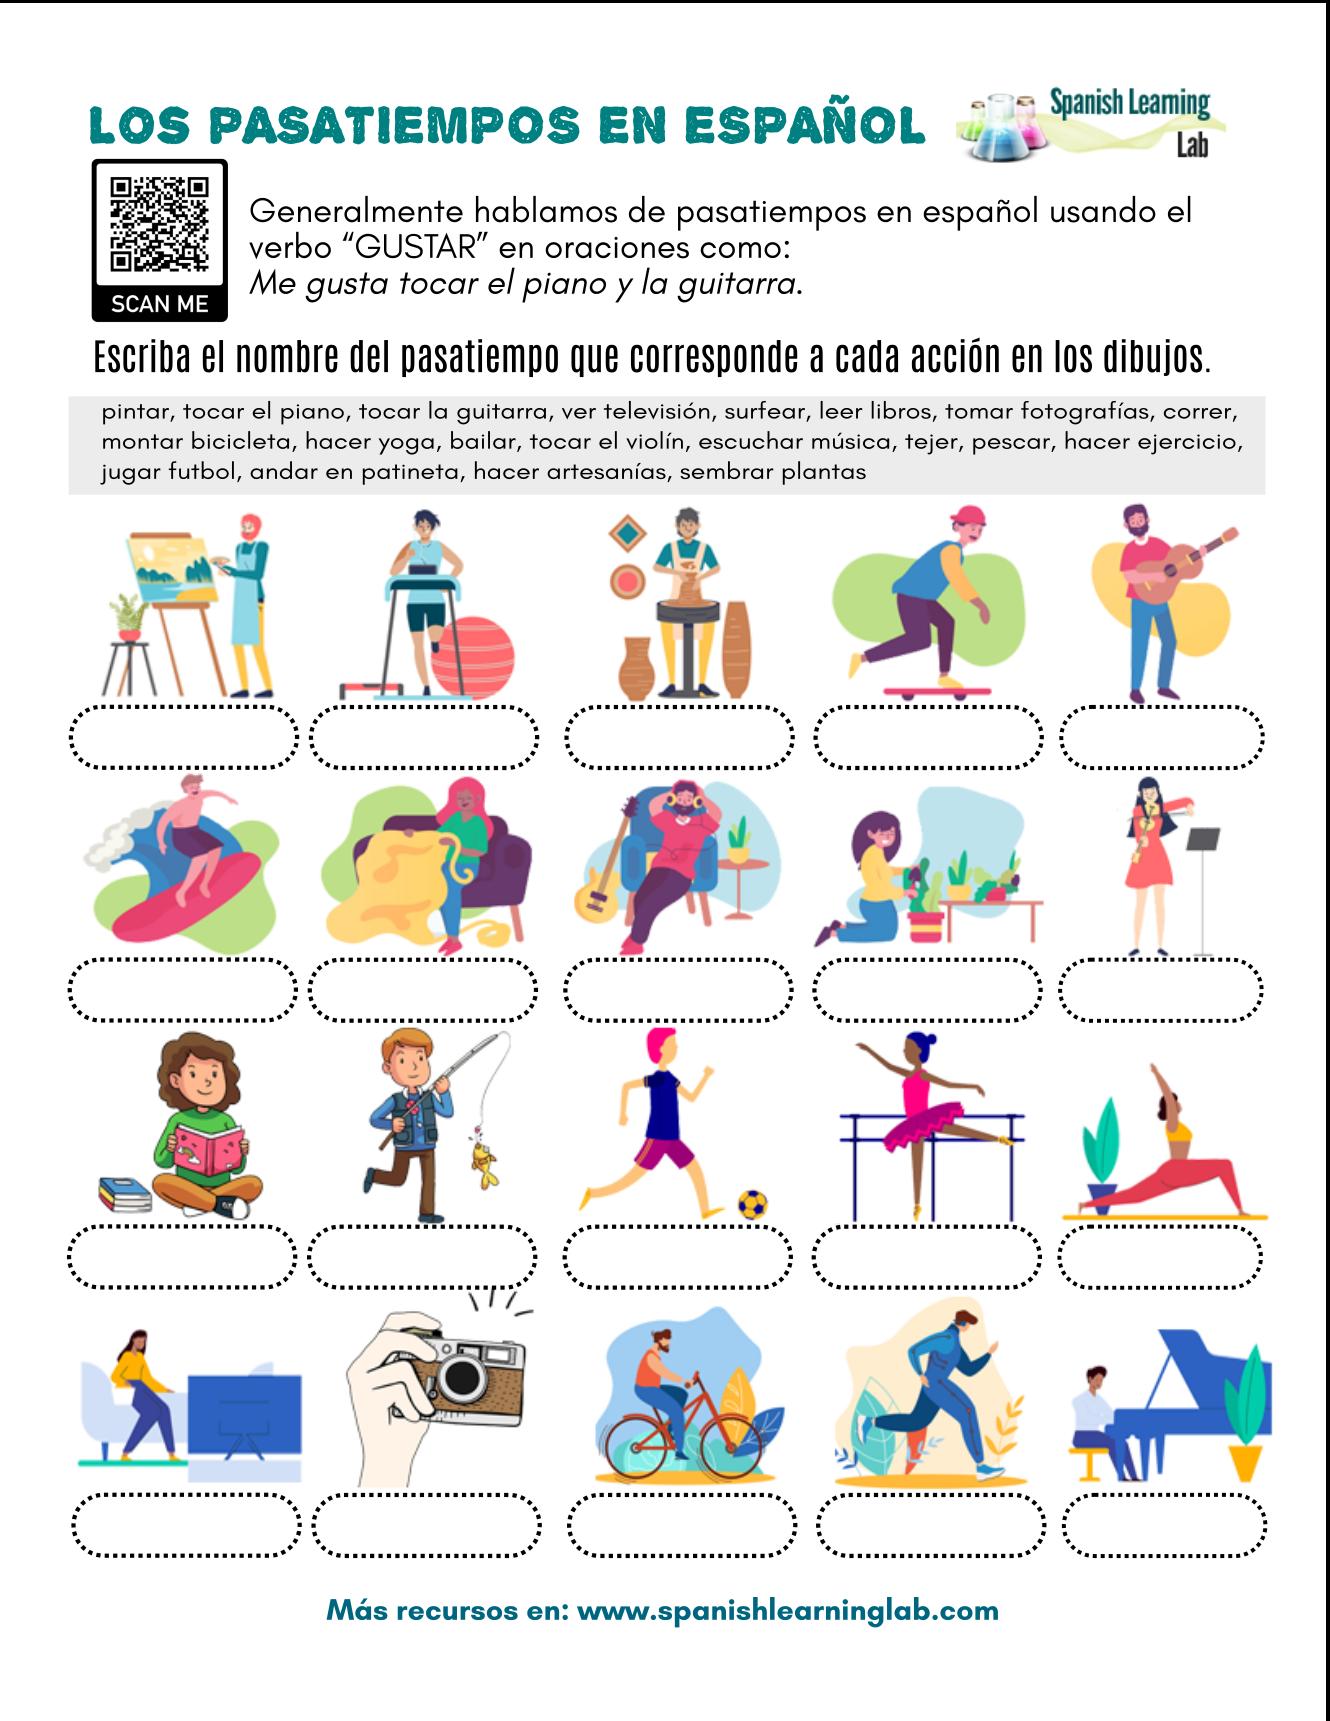 Common Hobbies In Spanish